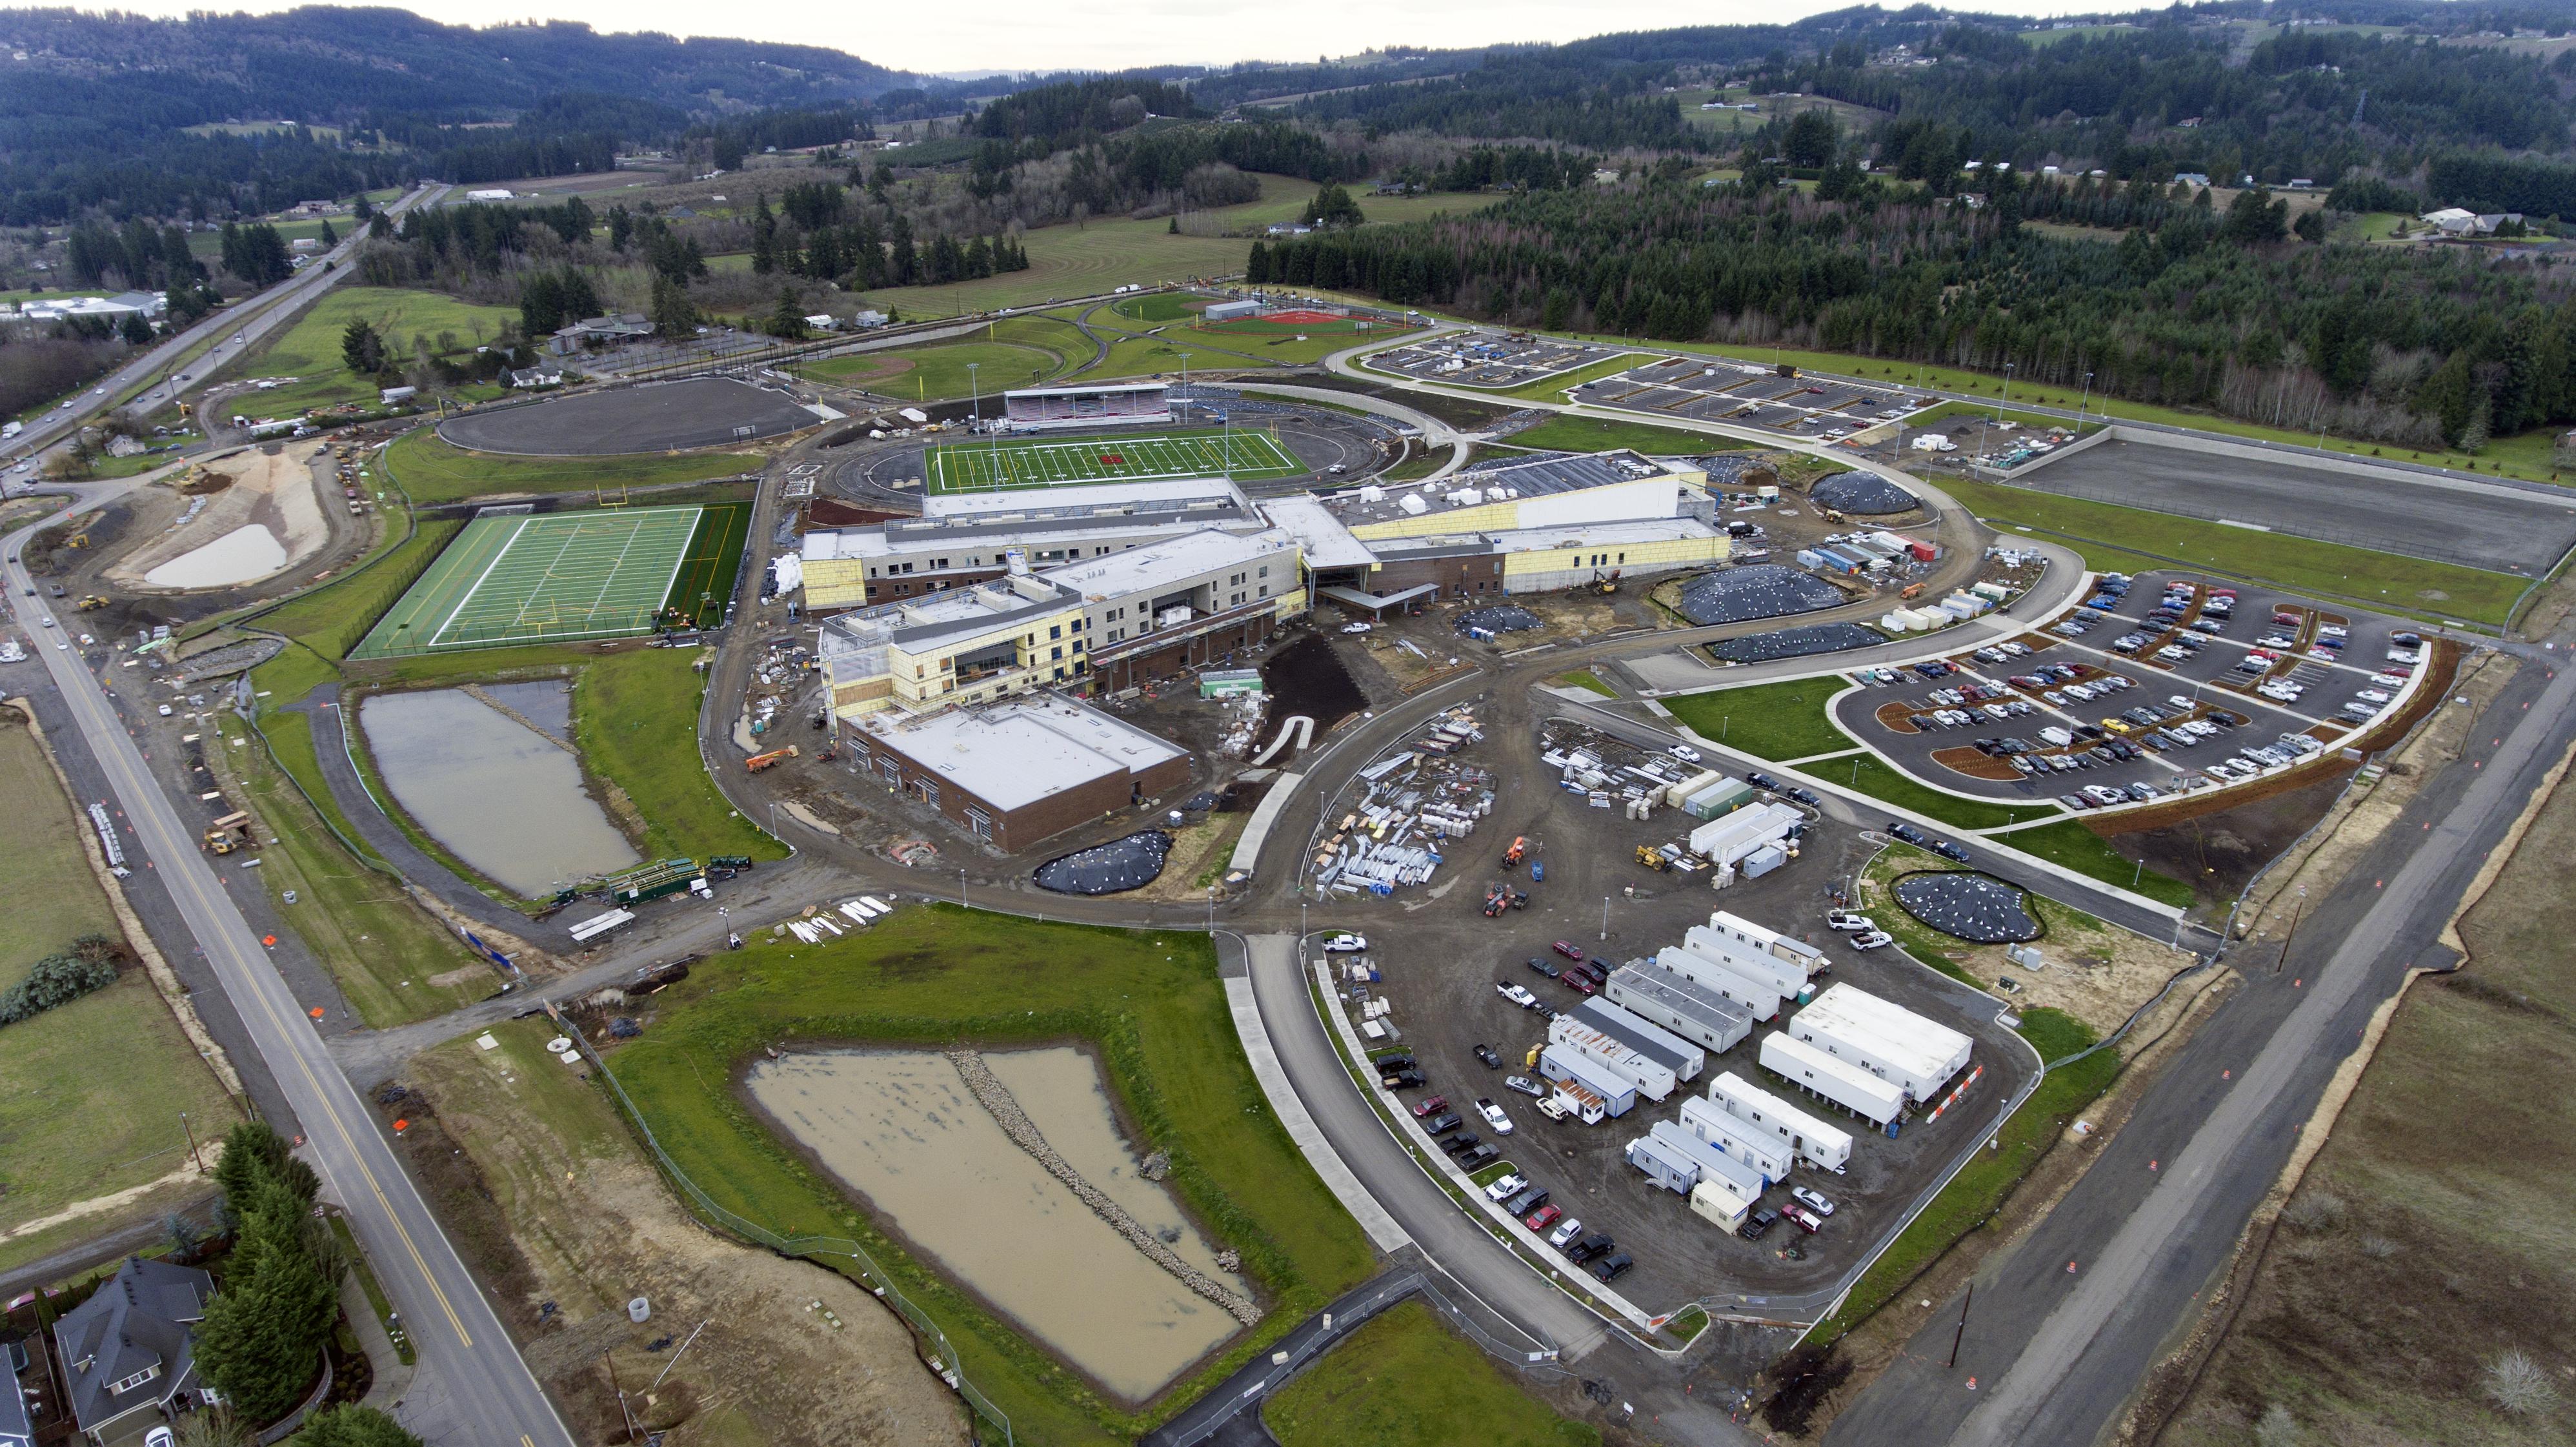 Aerial view of Sherwood High School Site